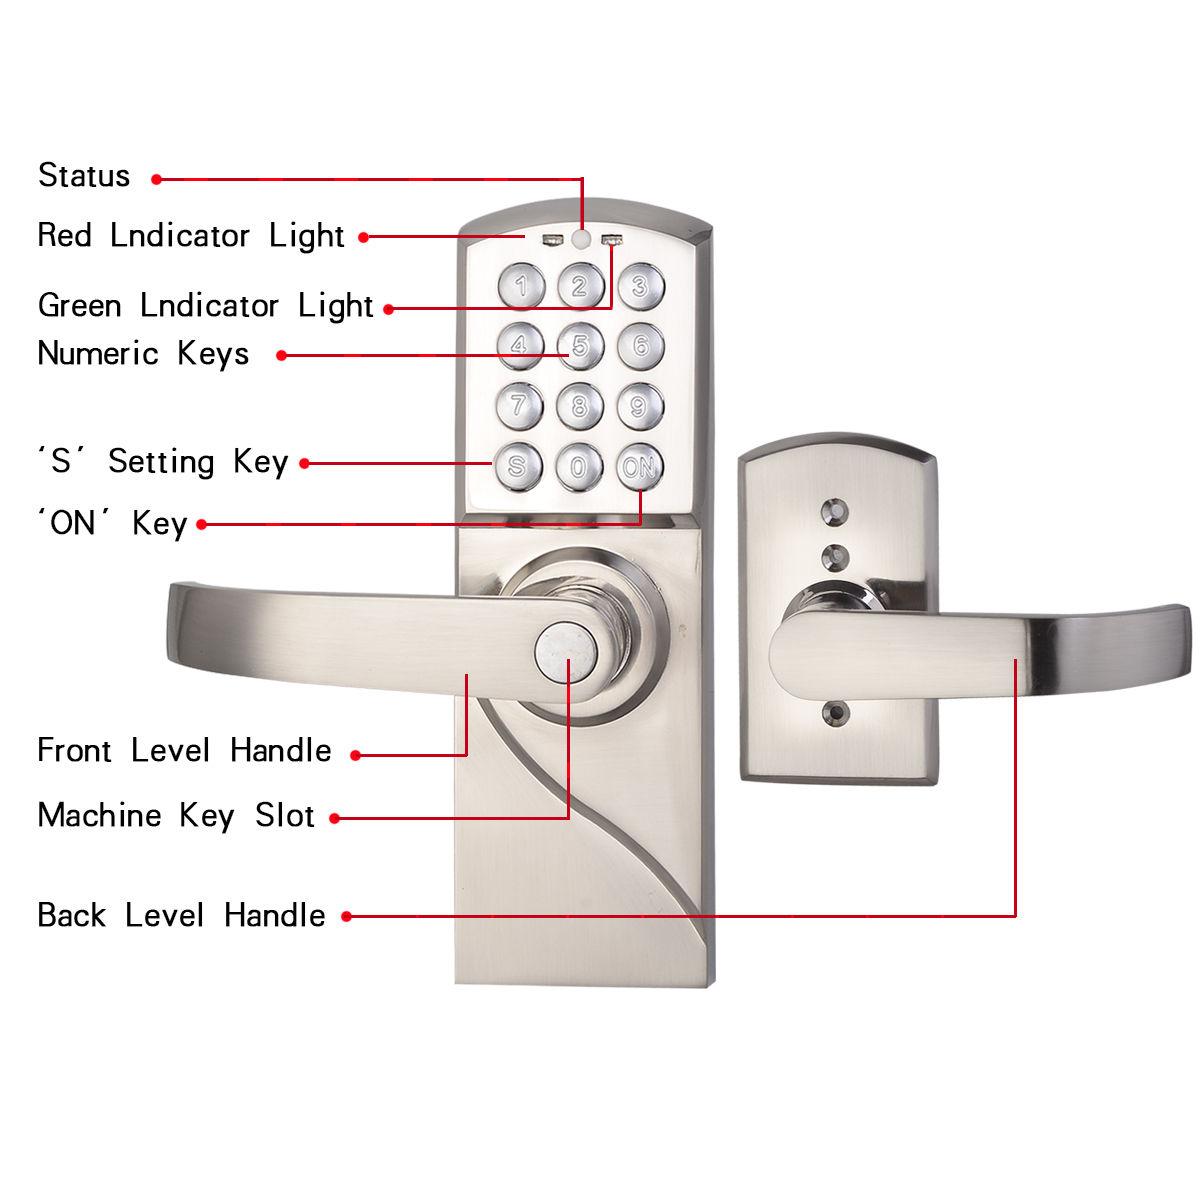 digital electronic code keyless keypad security entry door lock right handle new. Black Bedroom Furniture Sets. Home Design Ideas